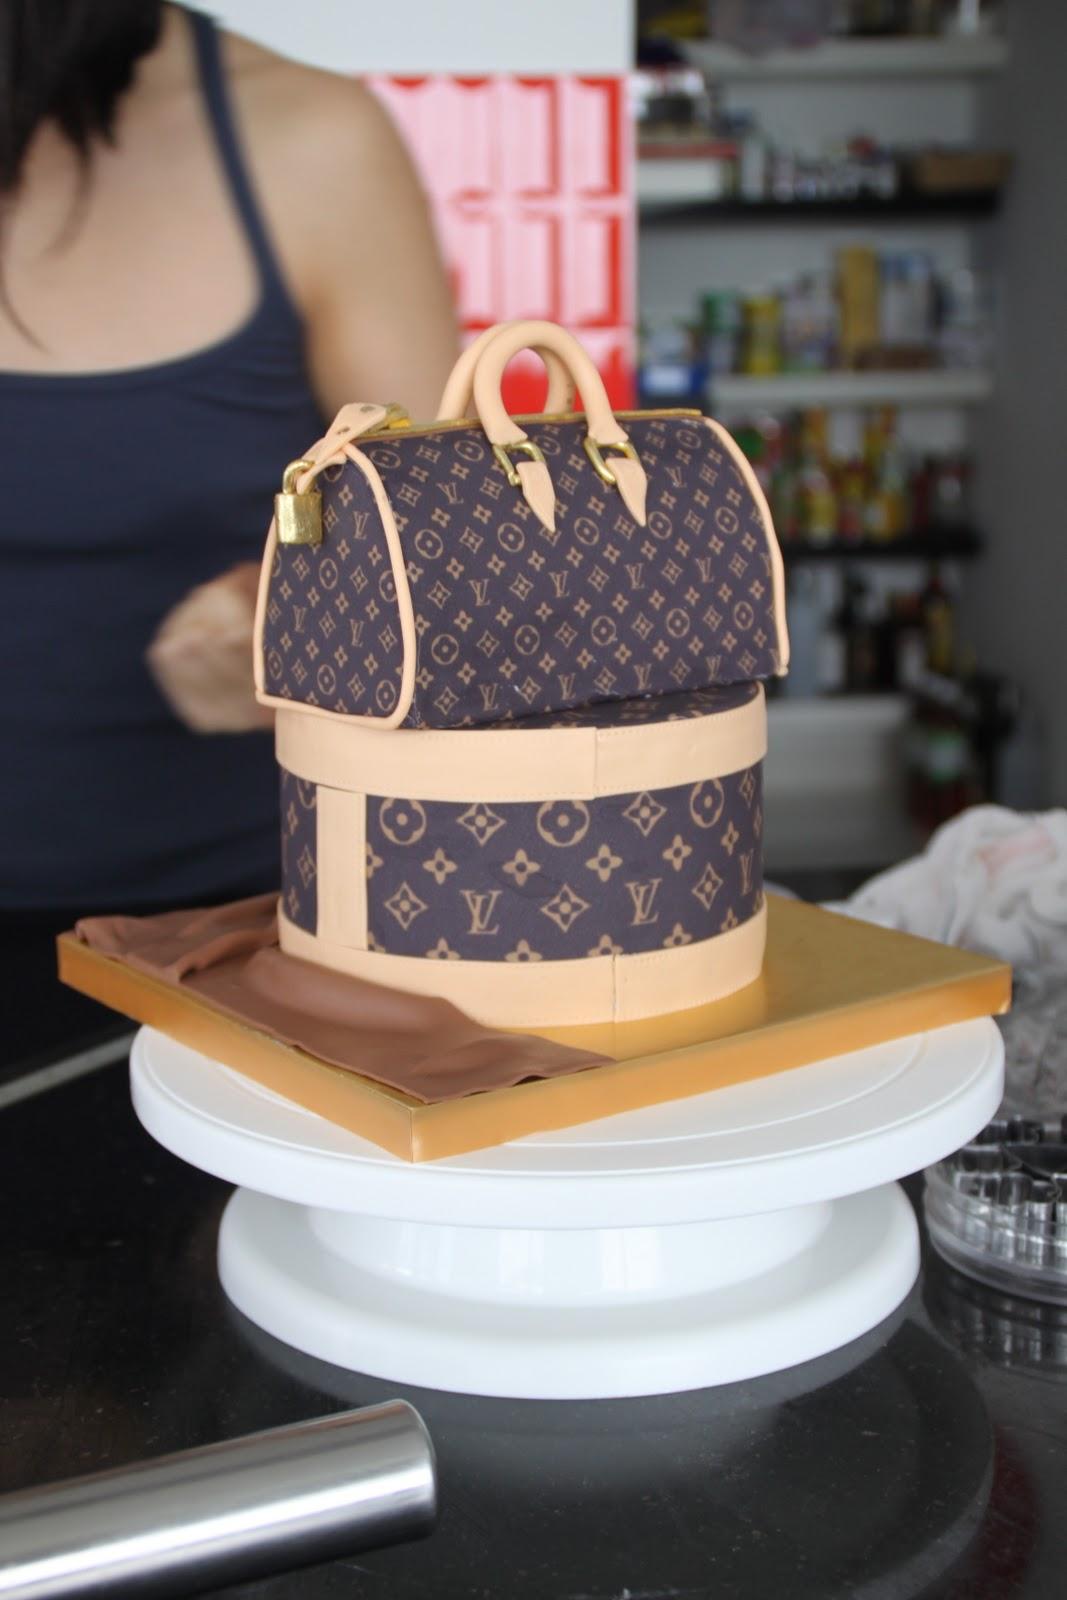 Celebrate With Cake Louis Vuitton Bag Cake